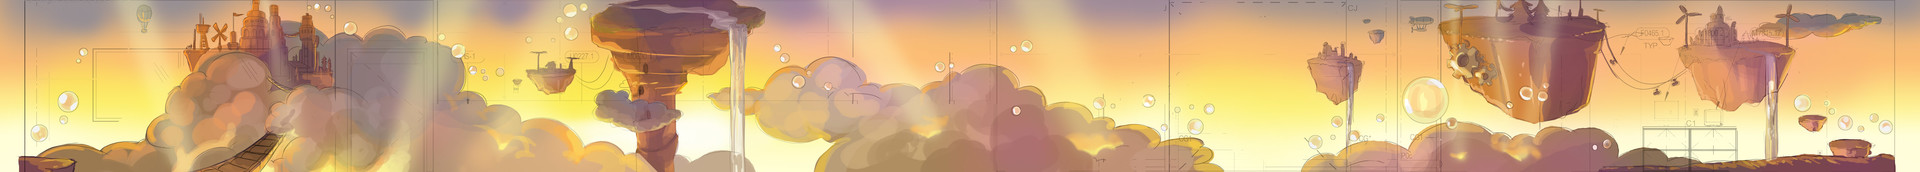 Amanda k colourrough skyroom